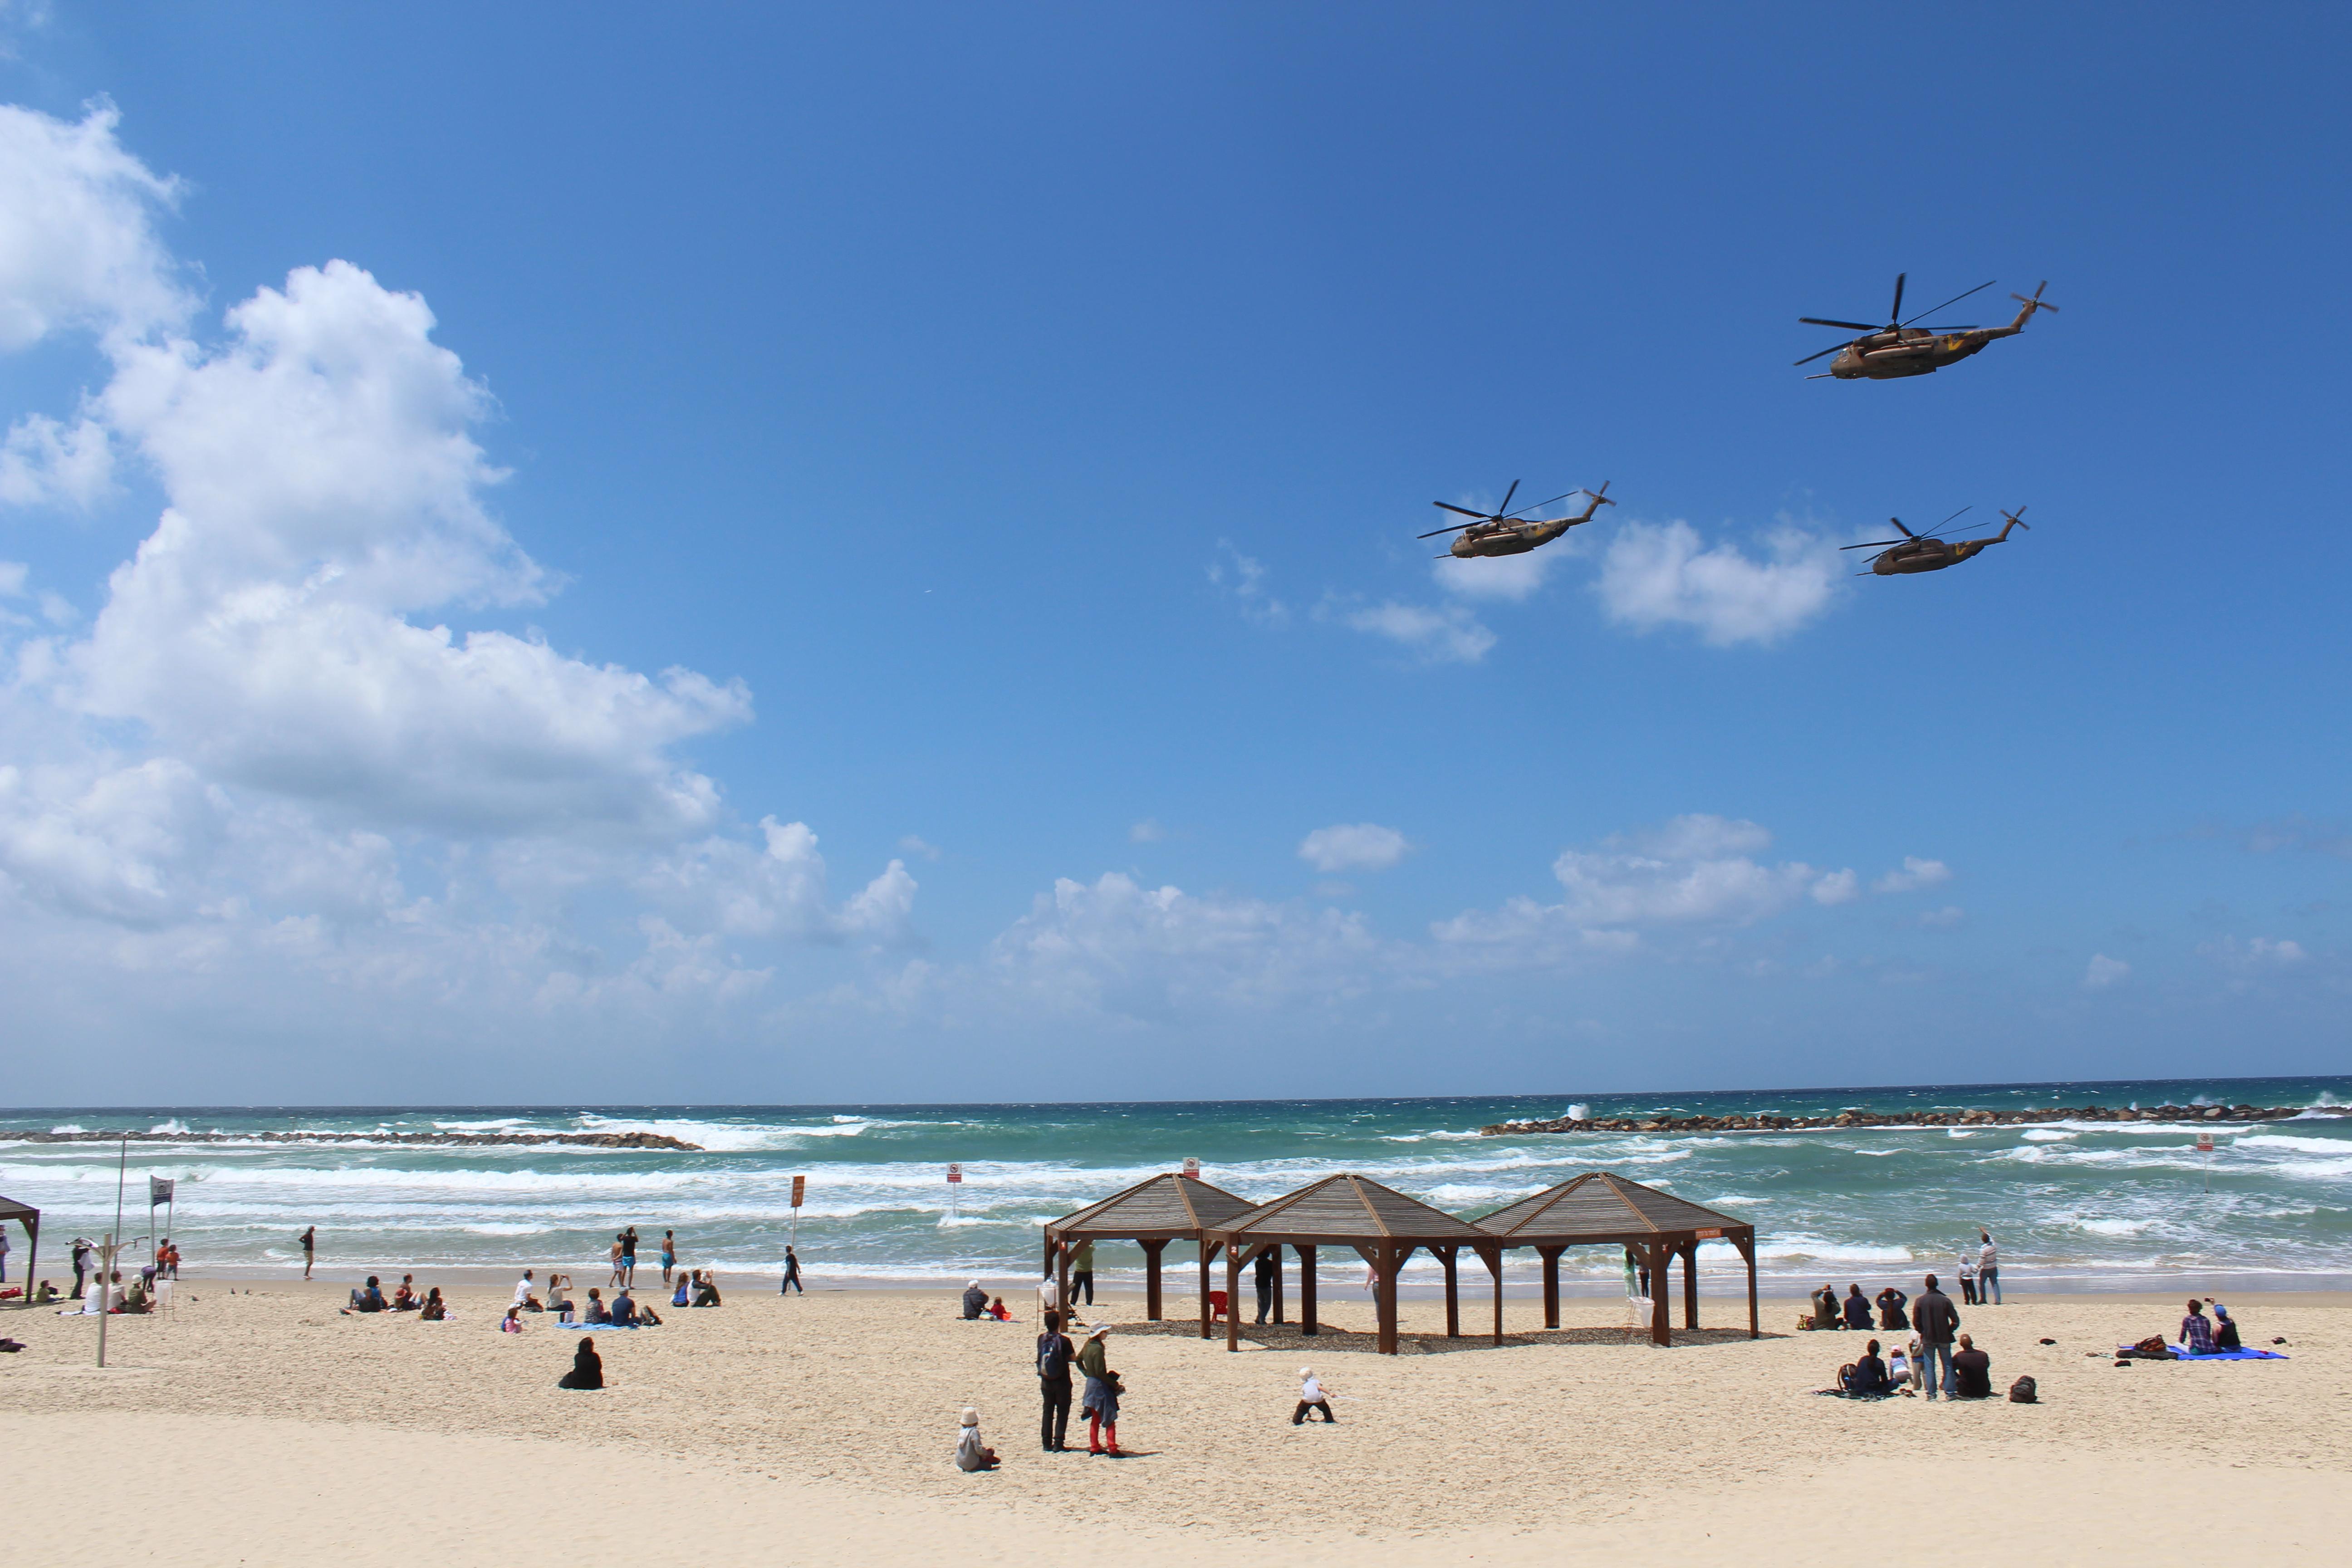 File:Air_Force_Fly_By_on_Tel_Aviv_Beach_IMG_1642 on Tel Aviv Beaches